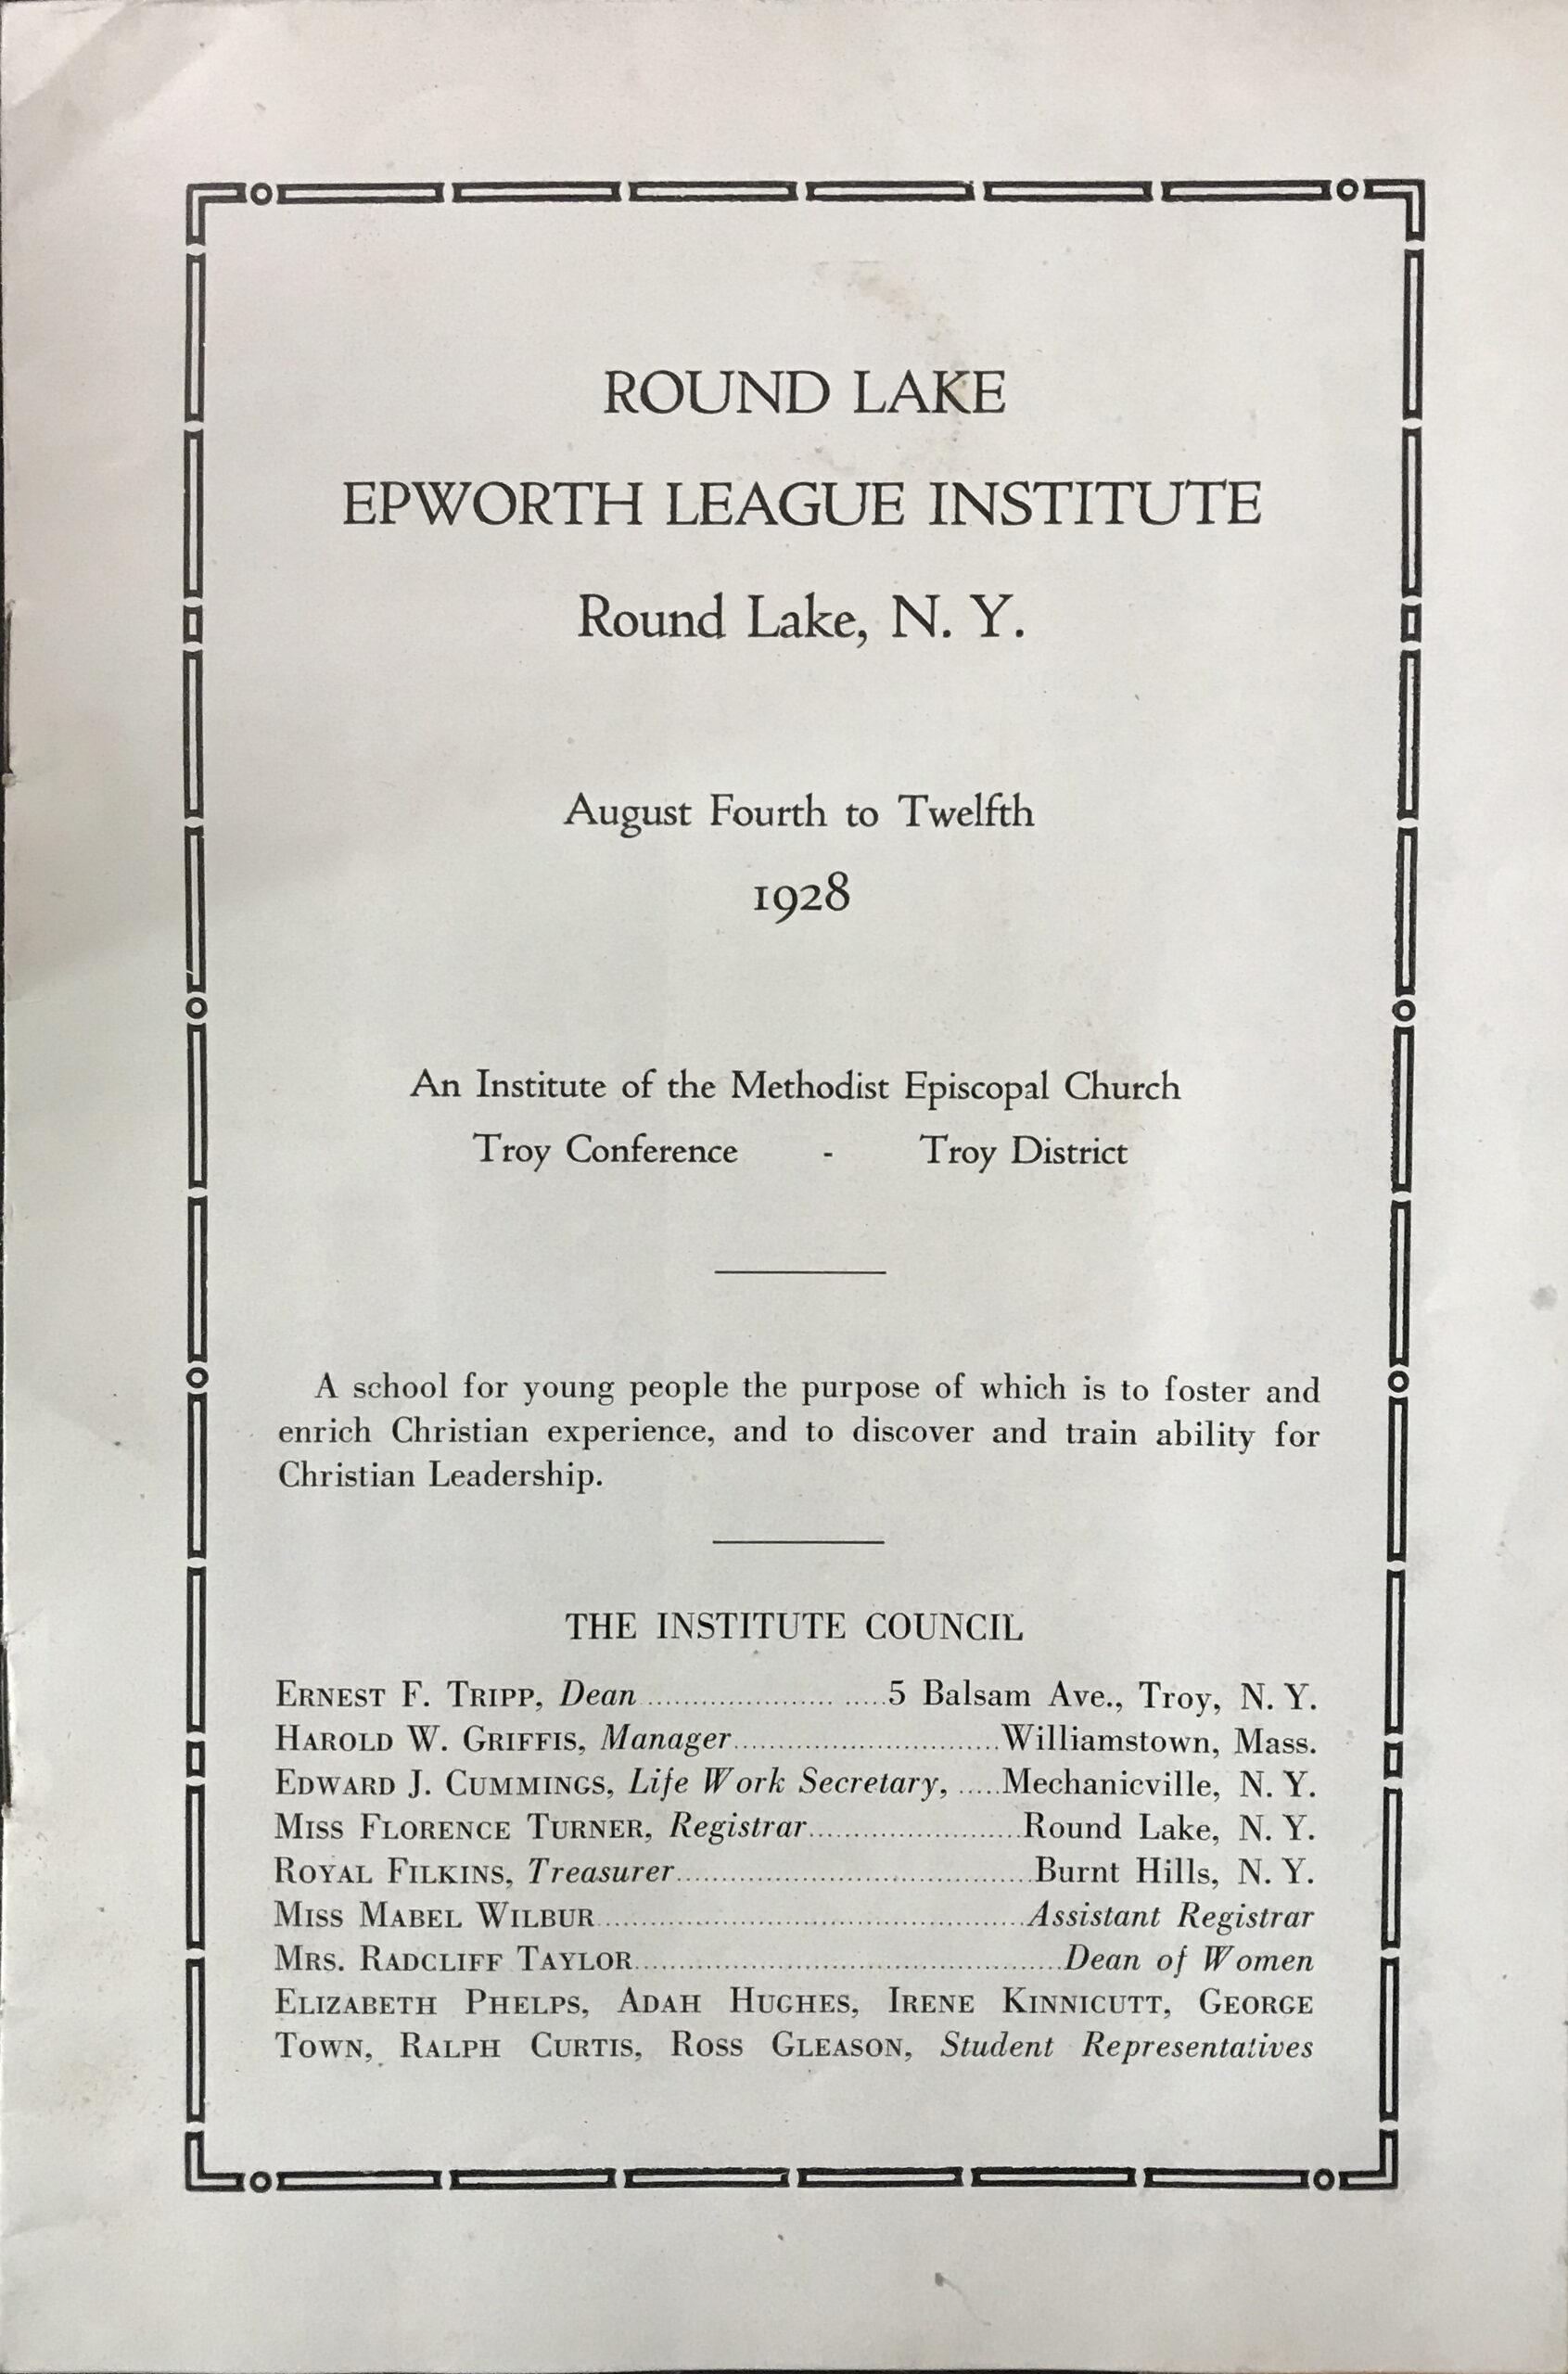 1928 Epworth League 1928 Page 1